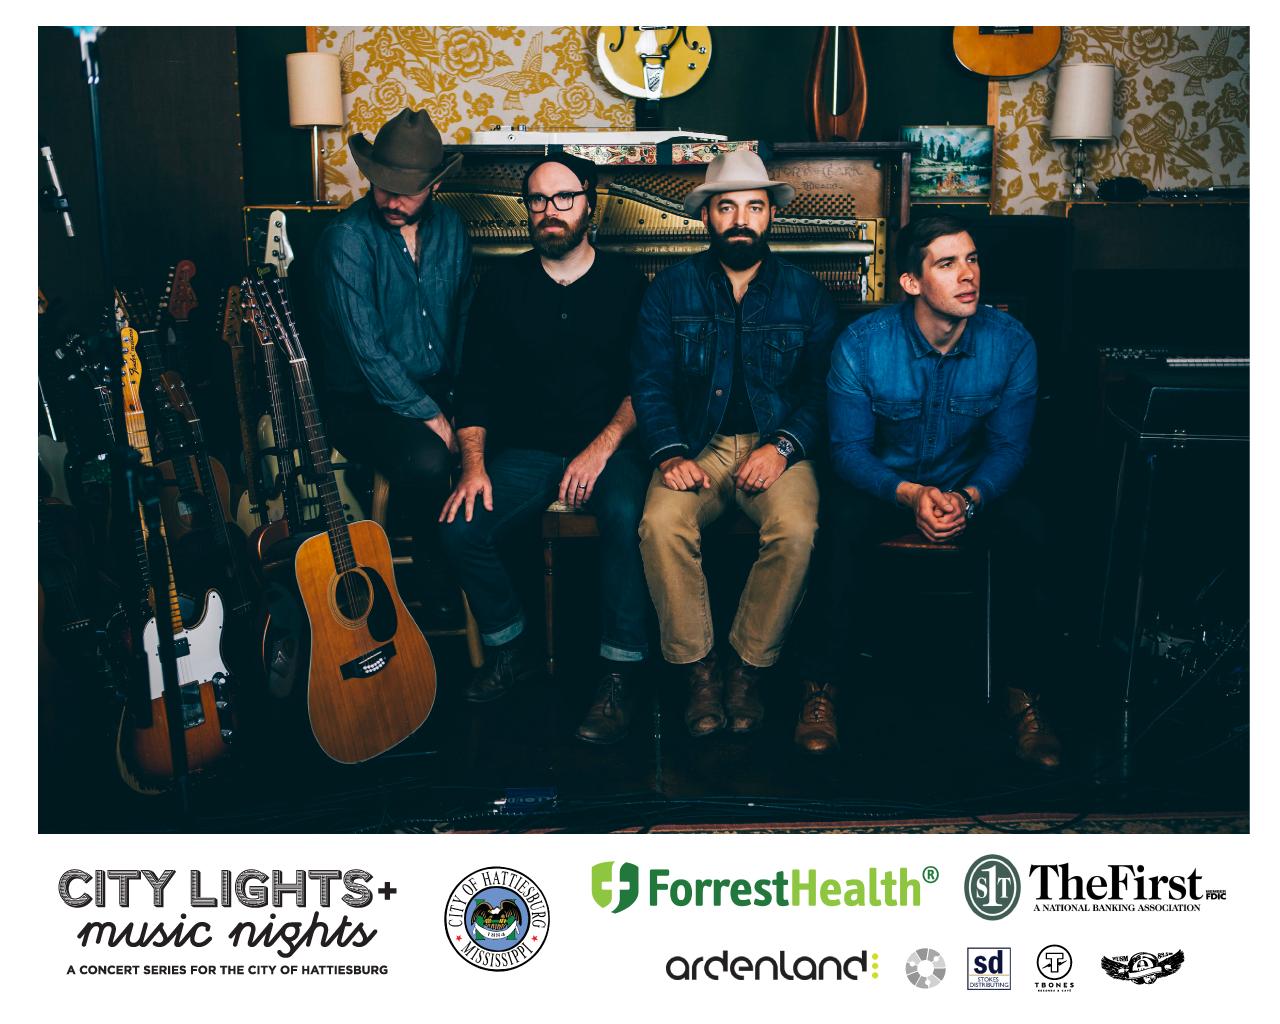 City Lights Music Nights Drew Holcomb The Neighbors City Of